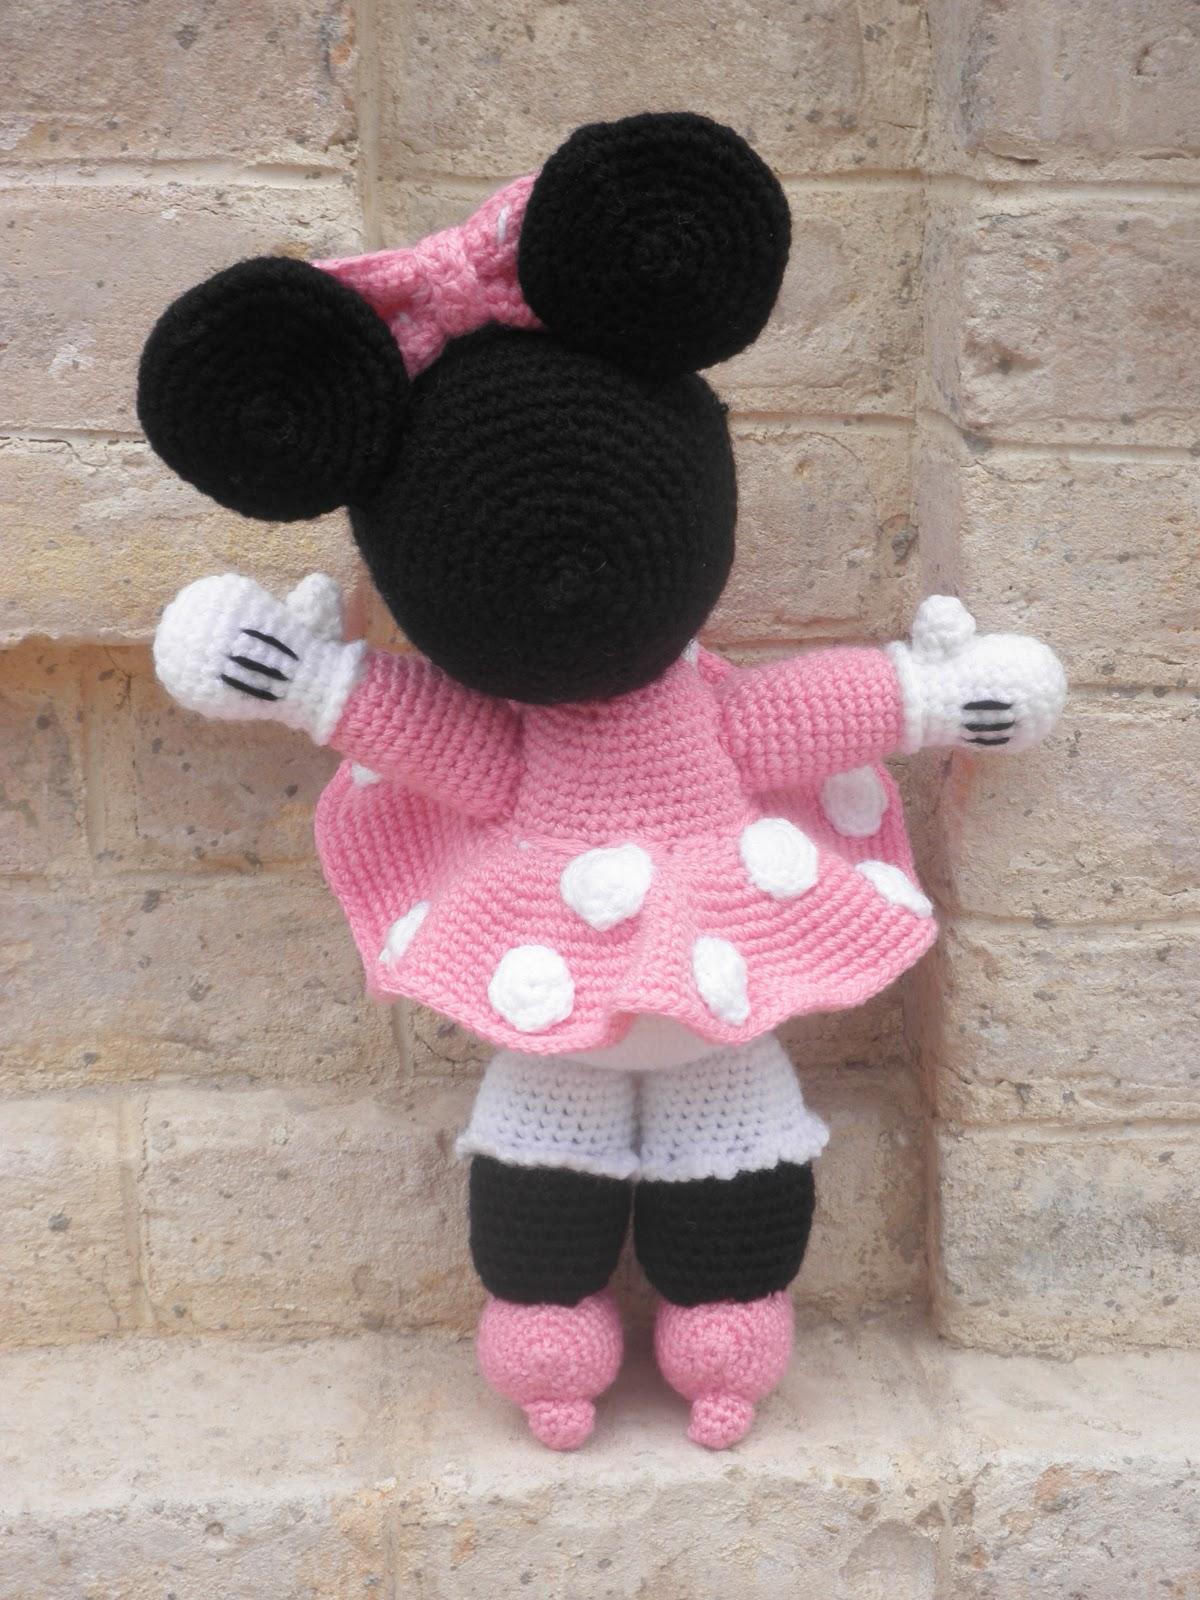 Minnie Mouse Amigurumi Crochet Pattern : Minnie Mouse Amigurumi Pattern Free Joy Studio Design ...